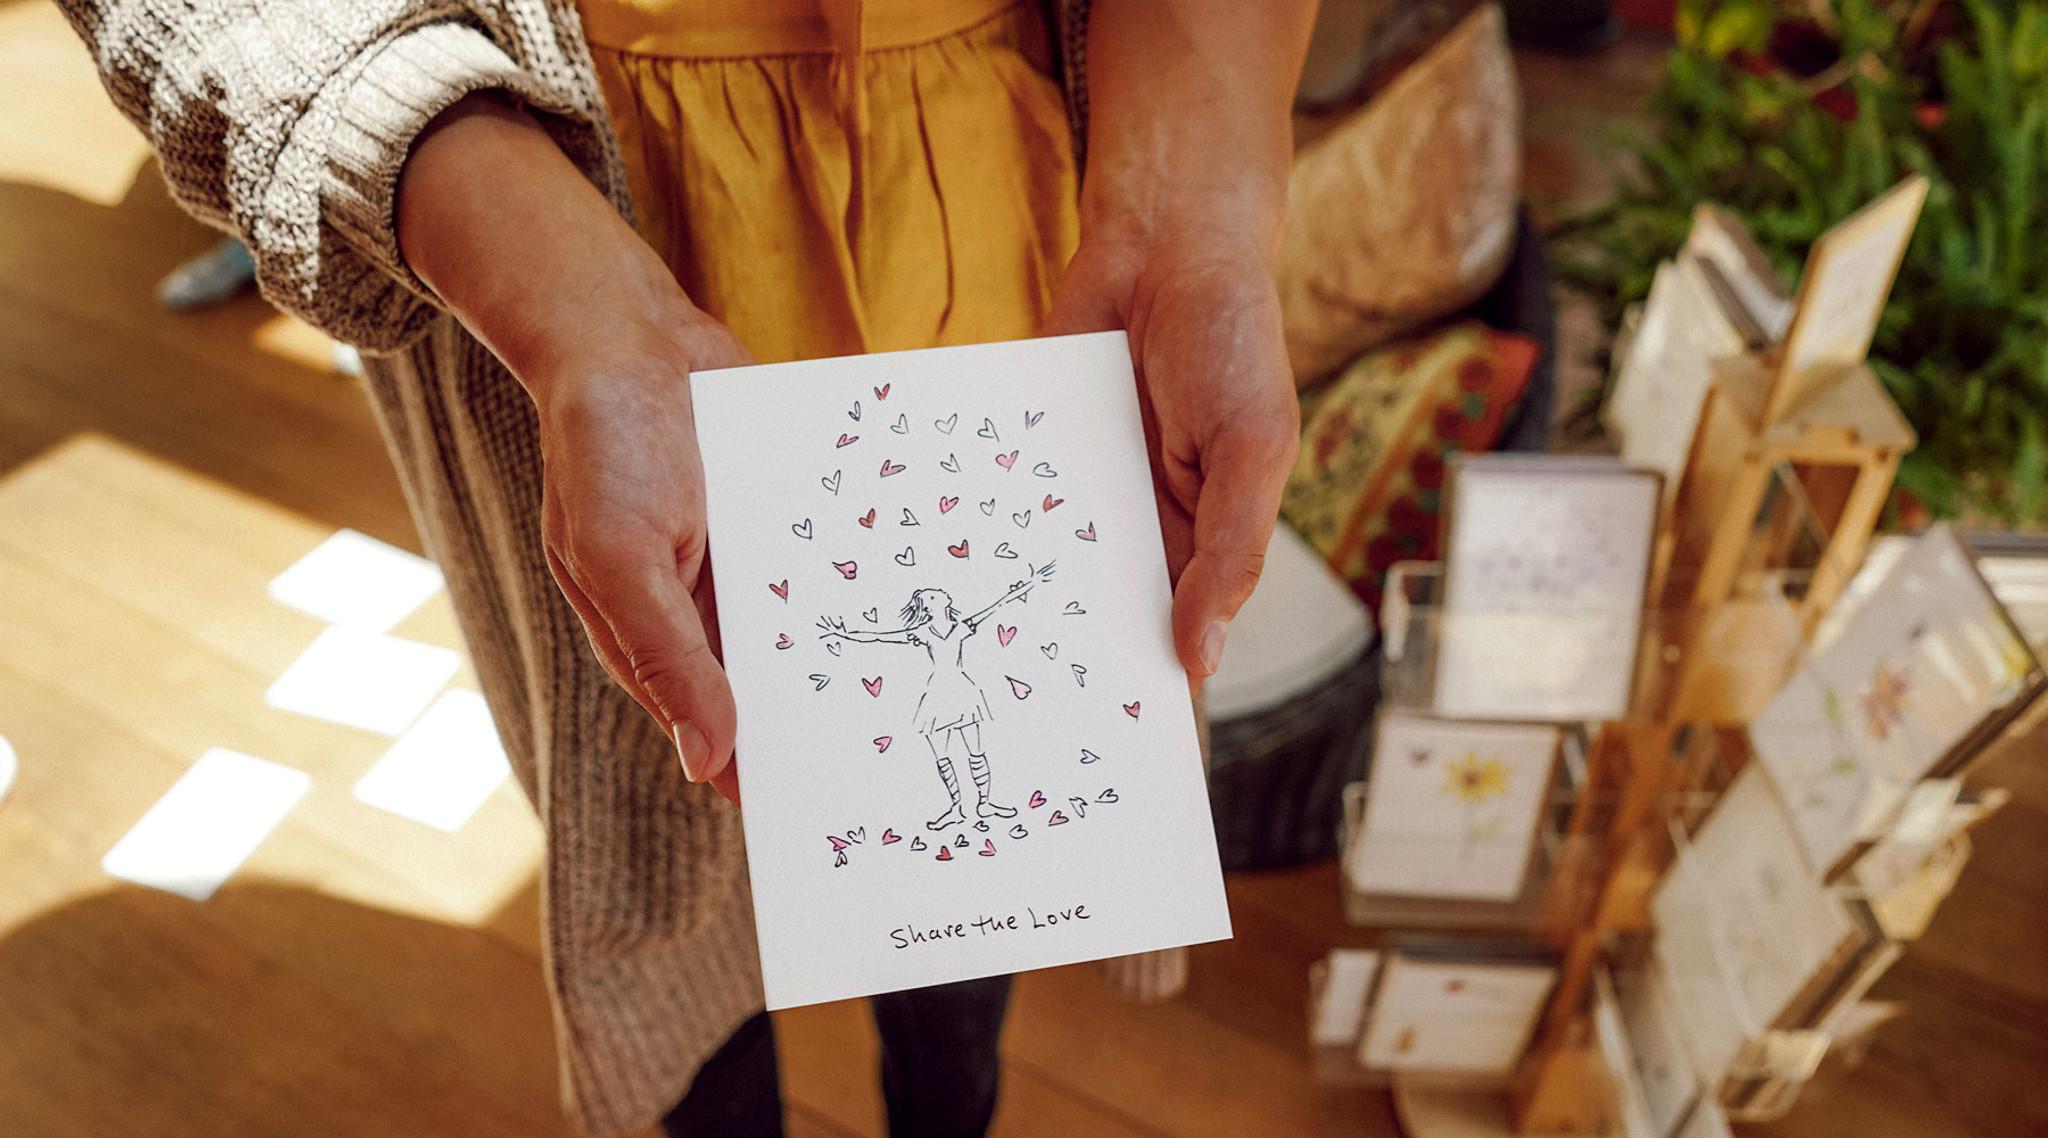 Receiving a card